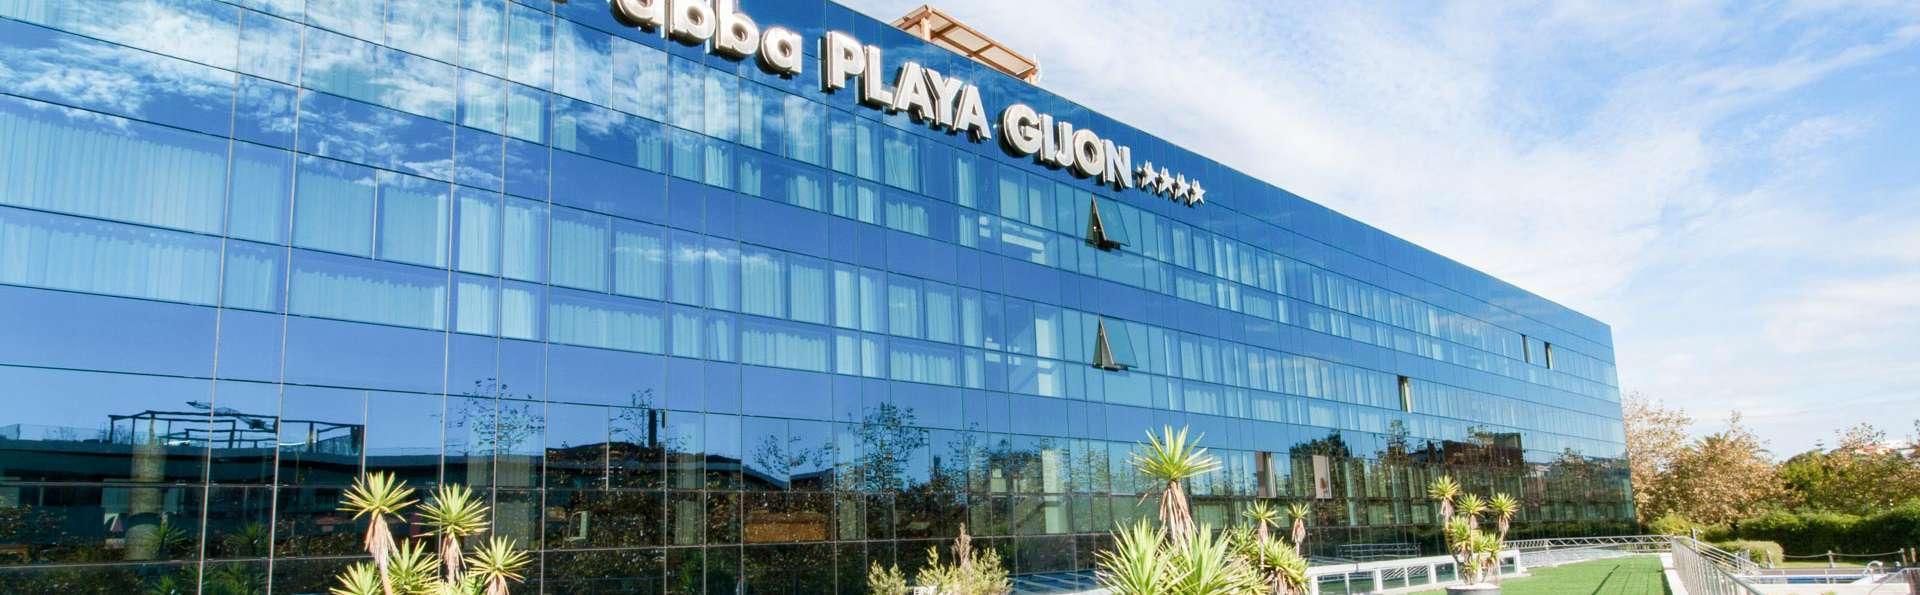 ABBA Playa Gijón - EDIT_FRONT_02.jpg